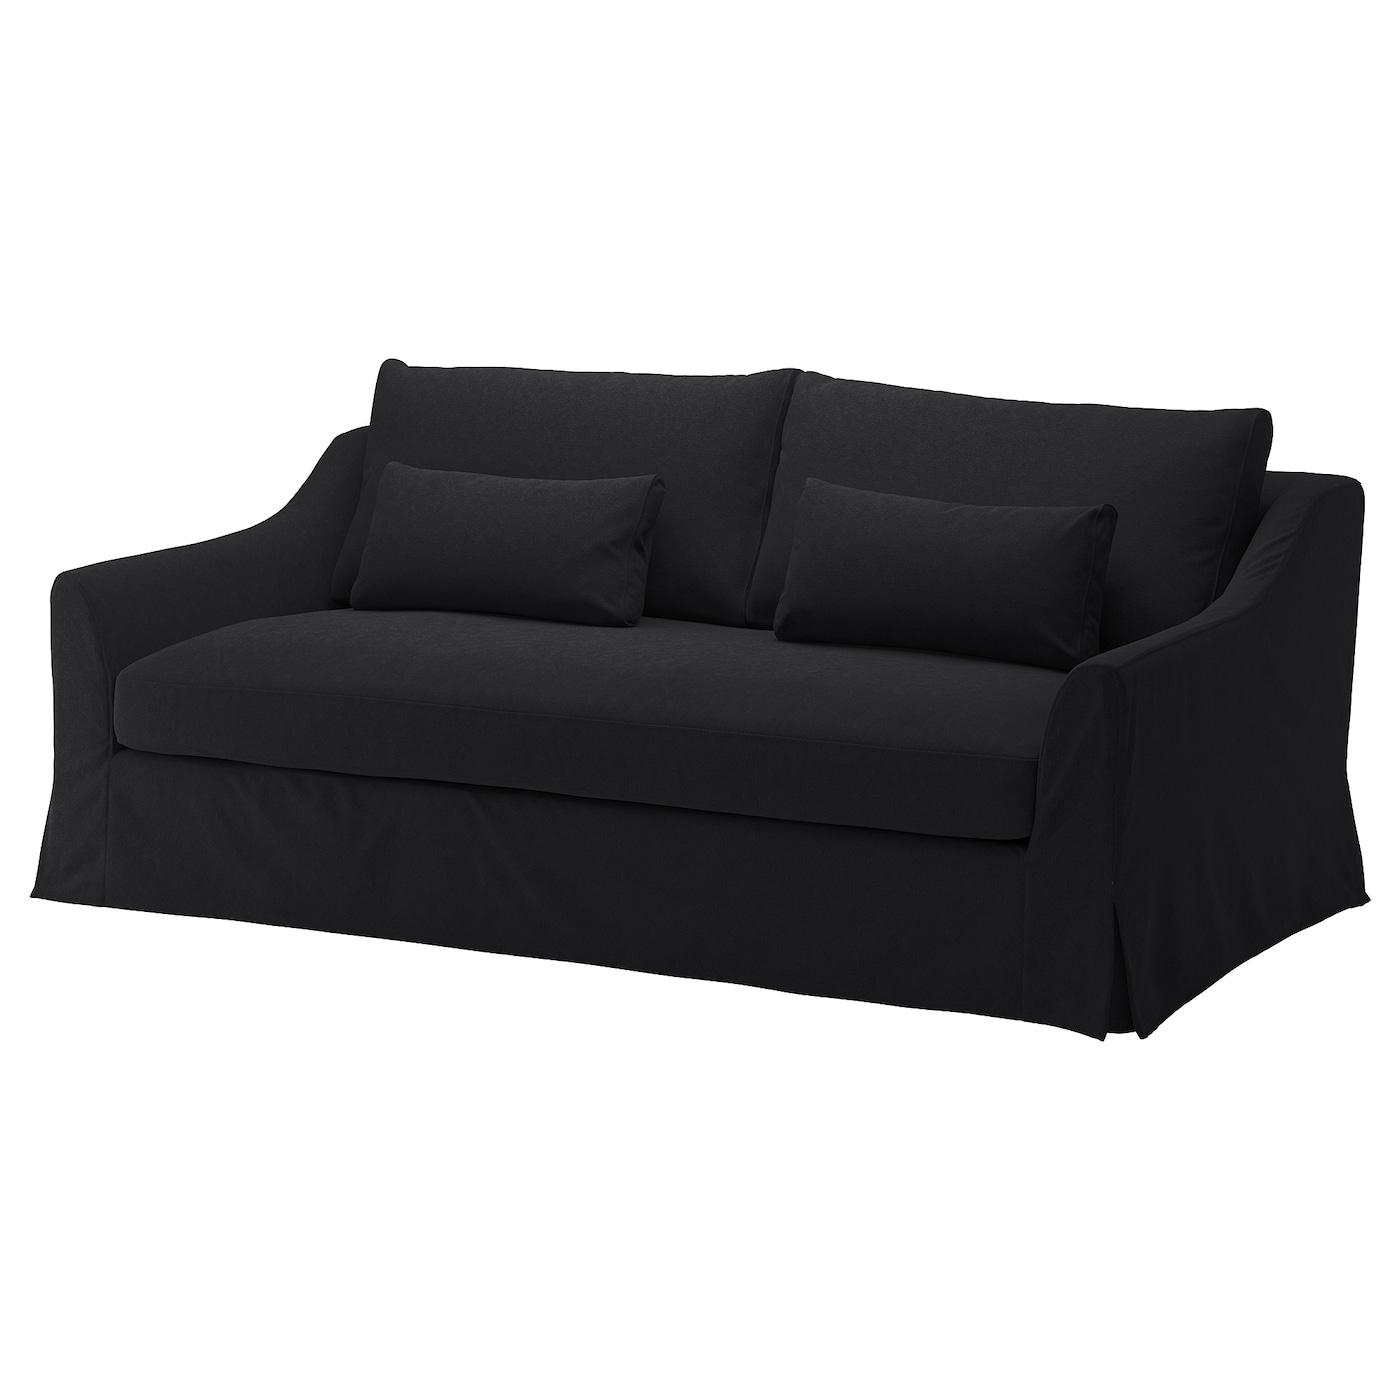 "F""RL–V 3 seat sofa Tallmyra dark grey IKEA"